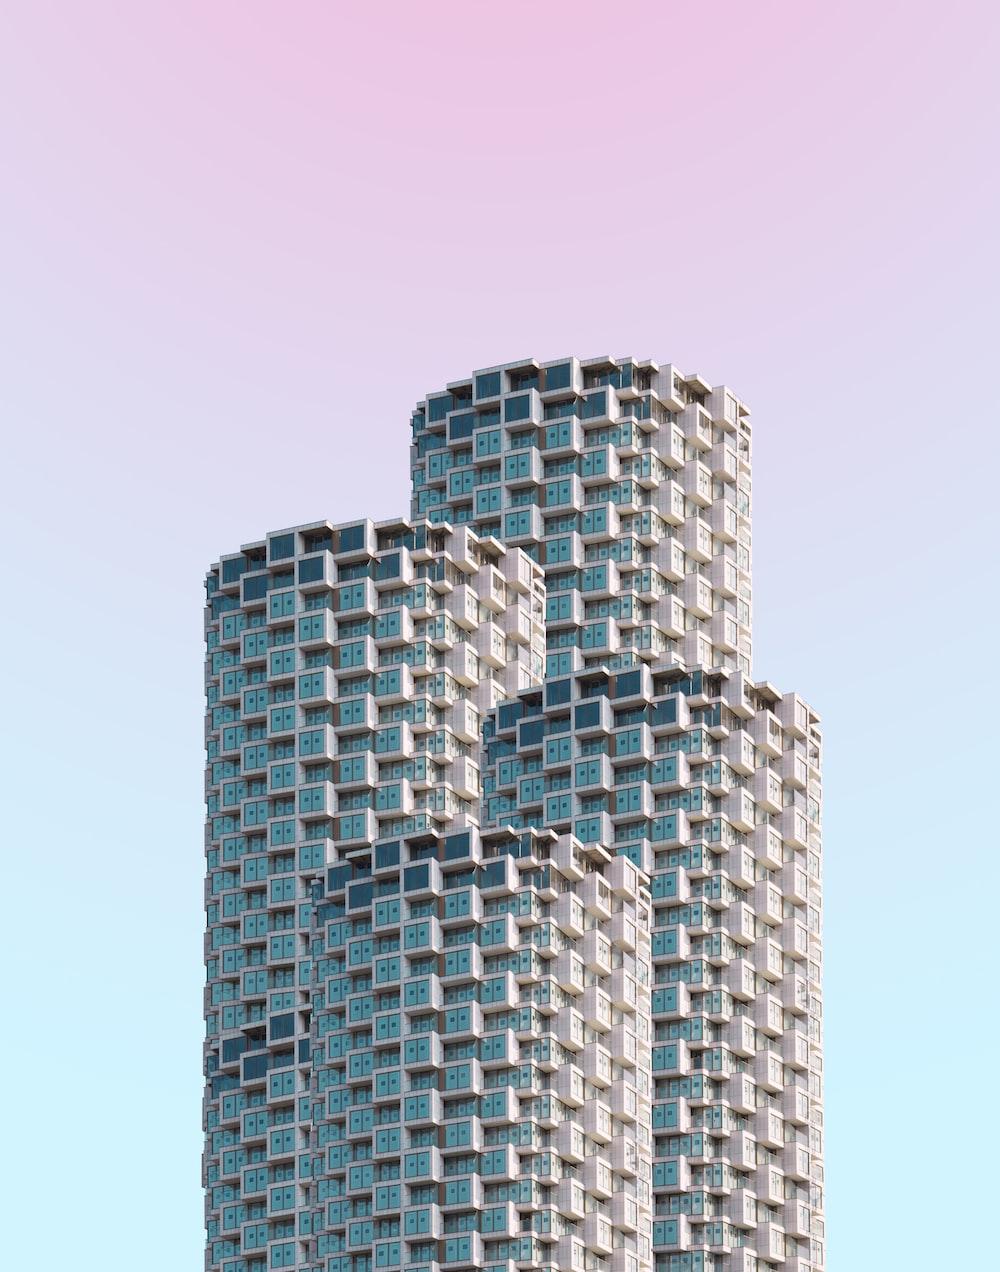 gray concrete building under clear blue sky